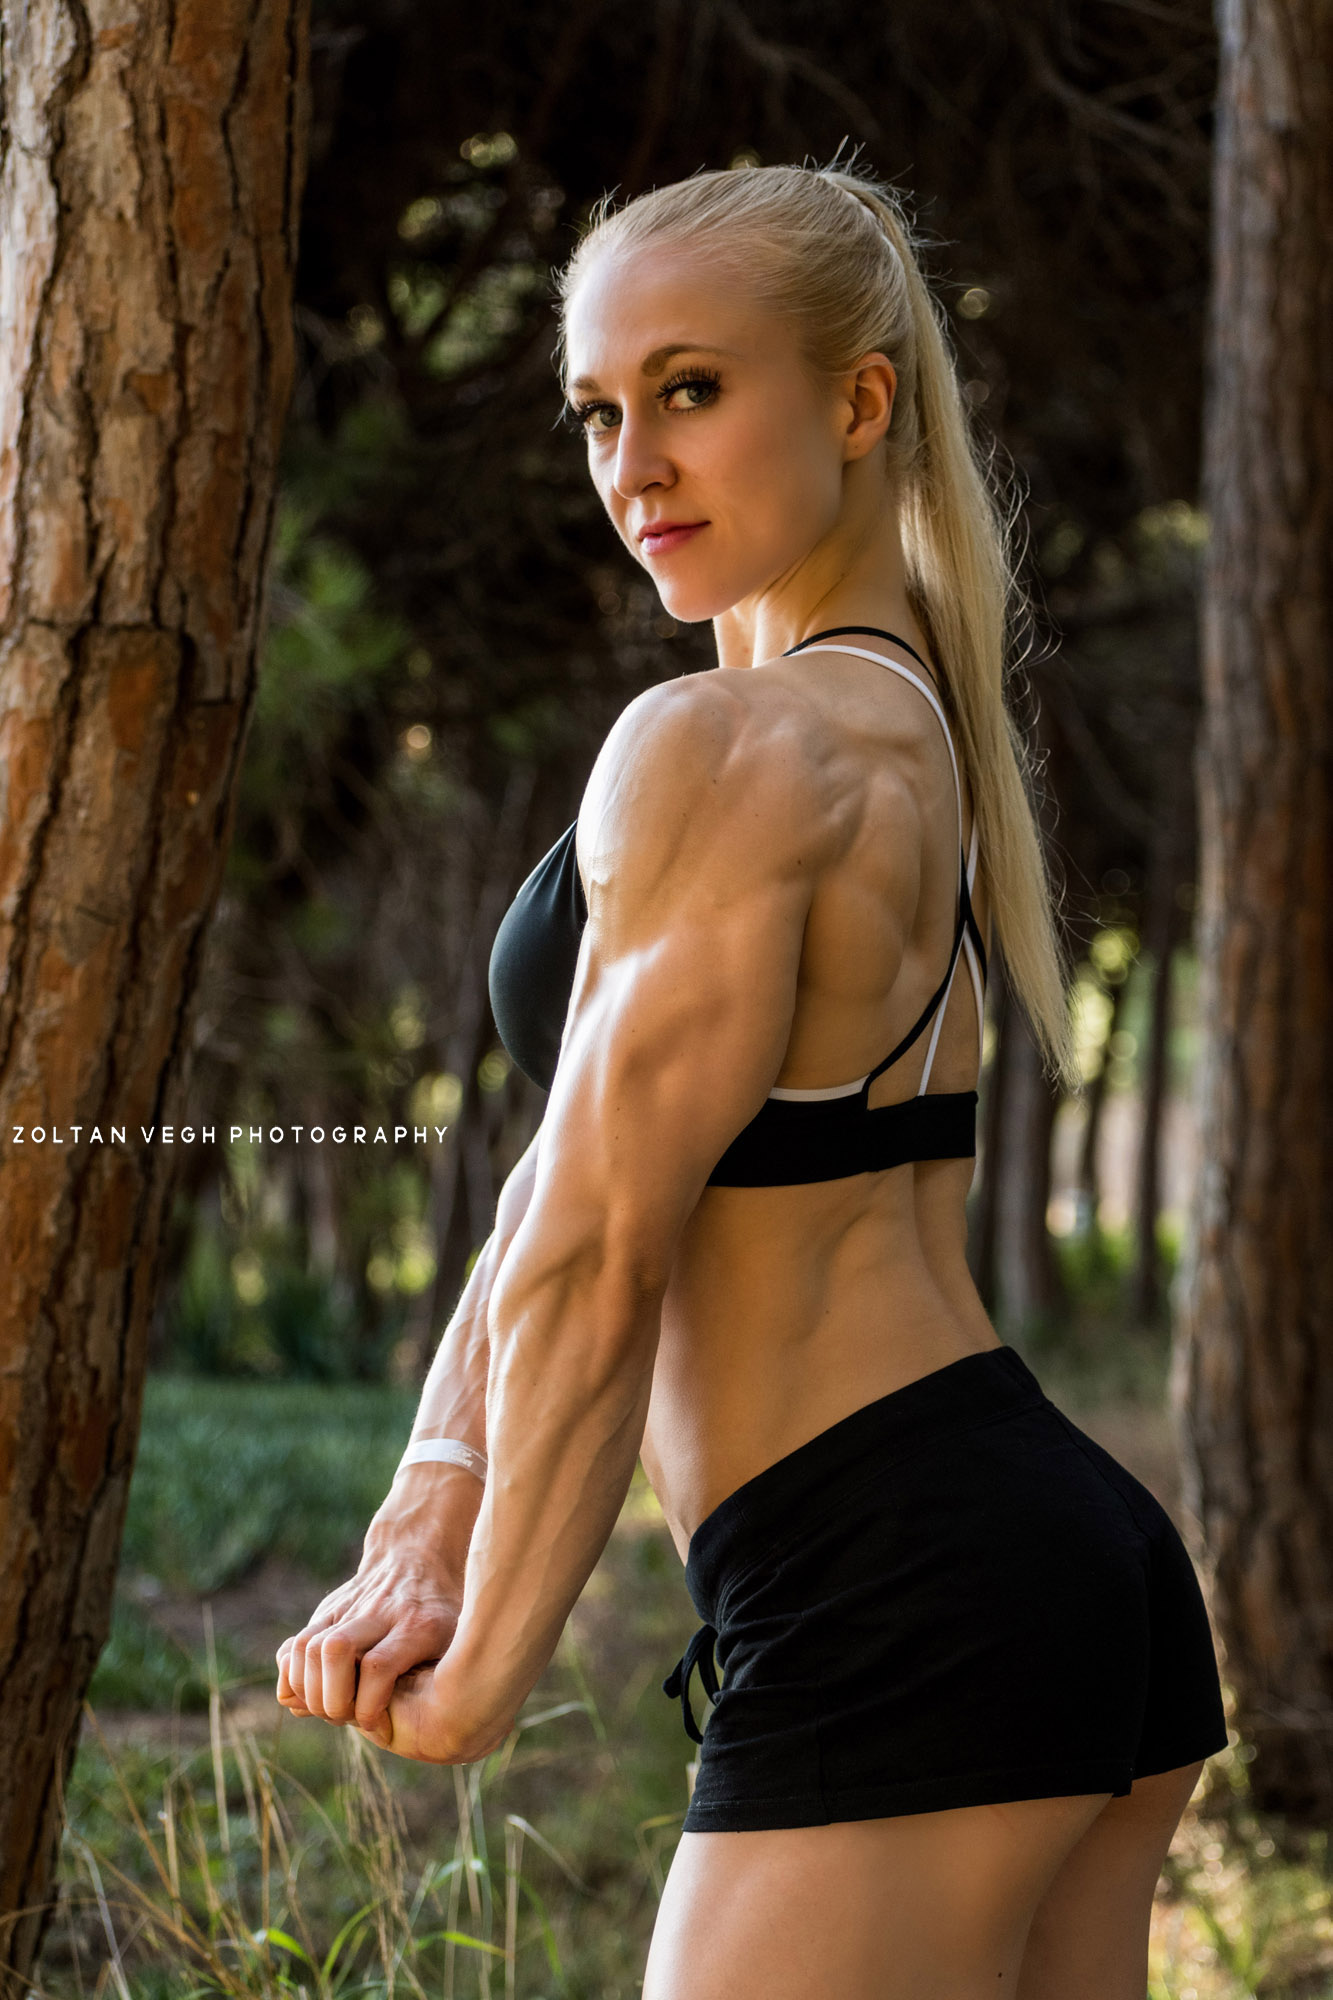 Anna-Sofia-Pekkarinen06.jpg